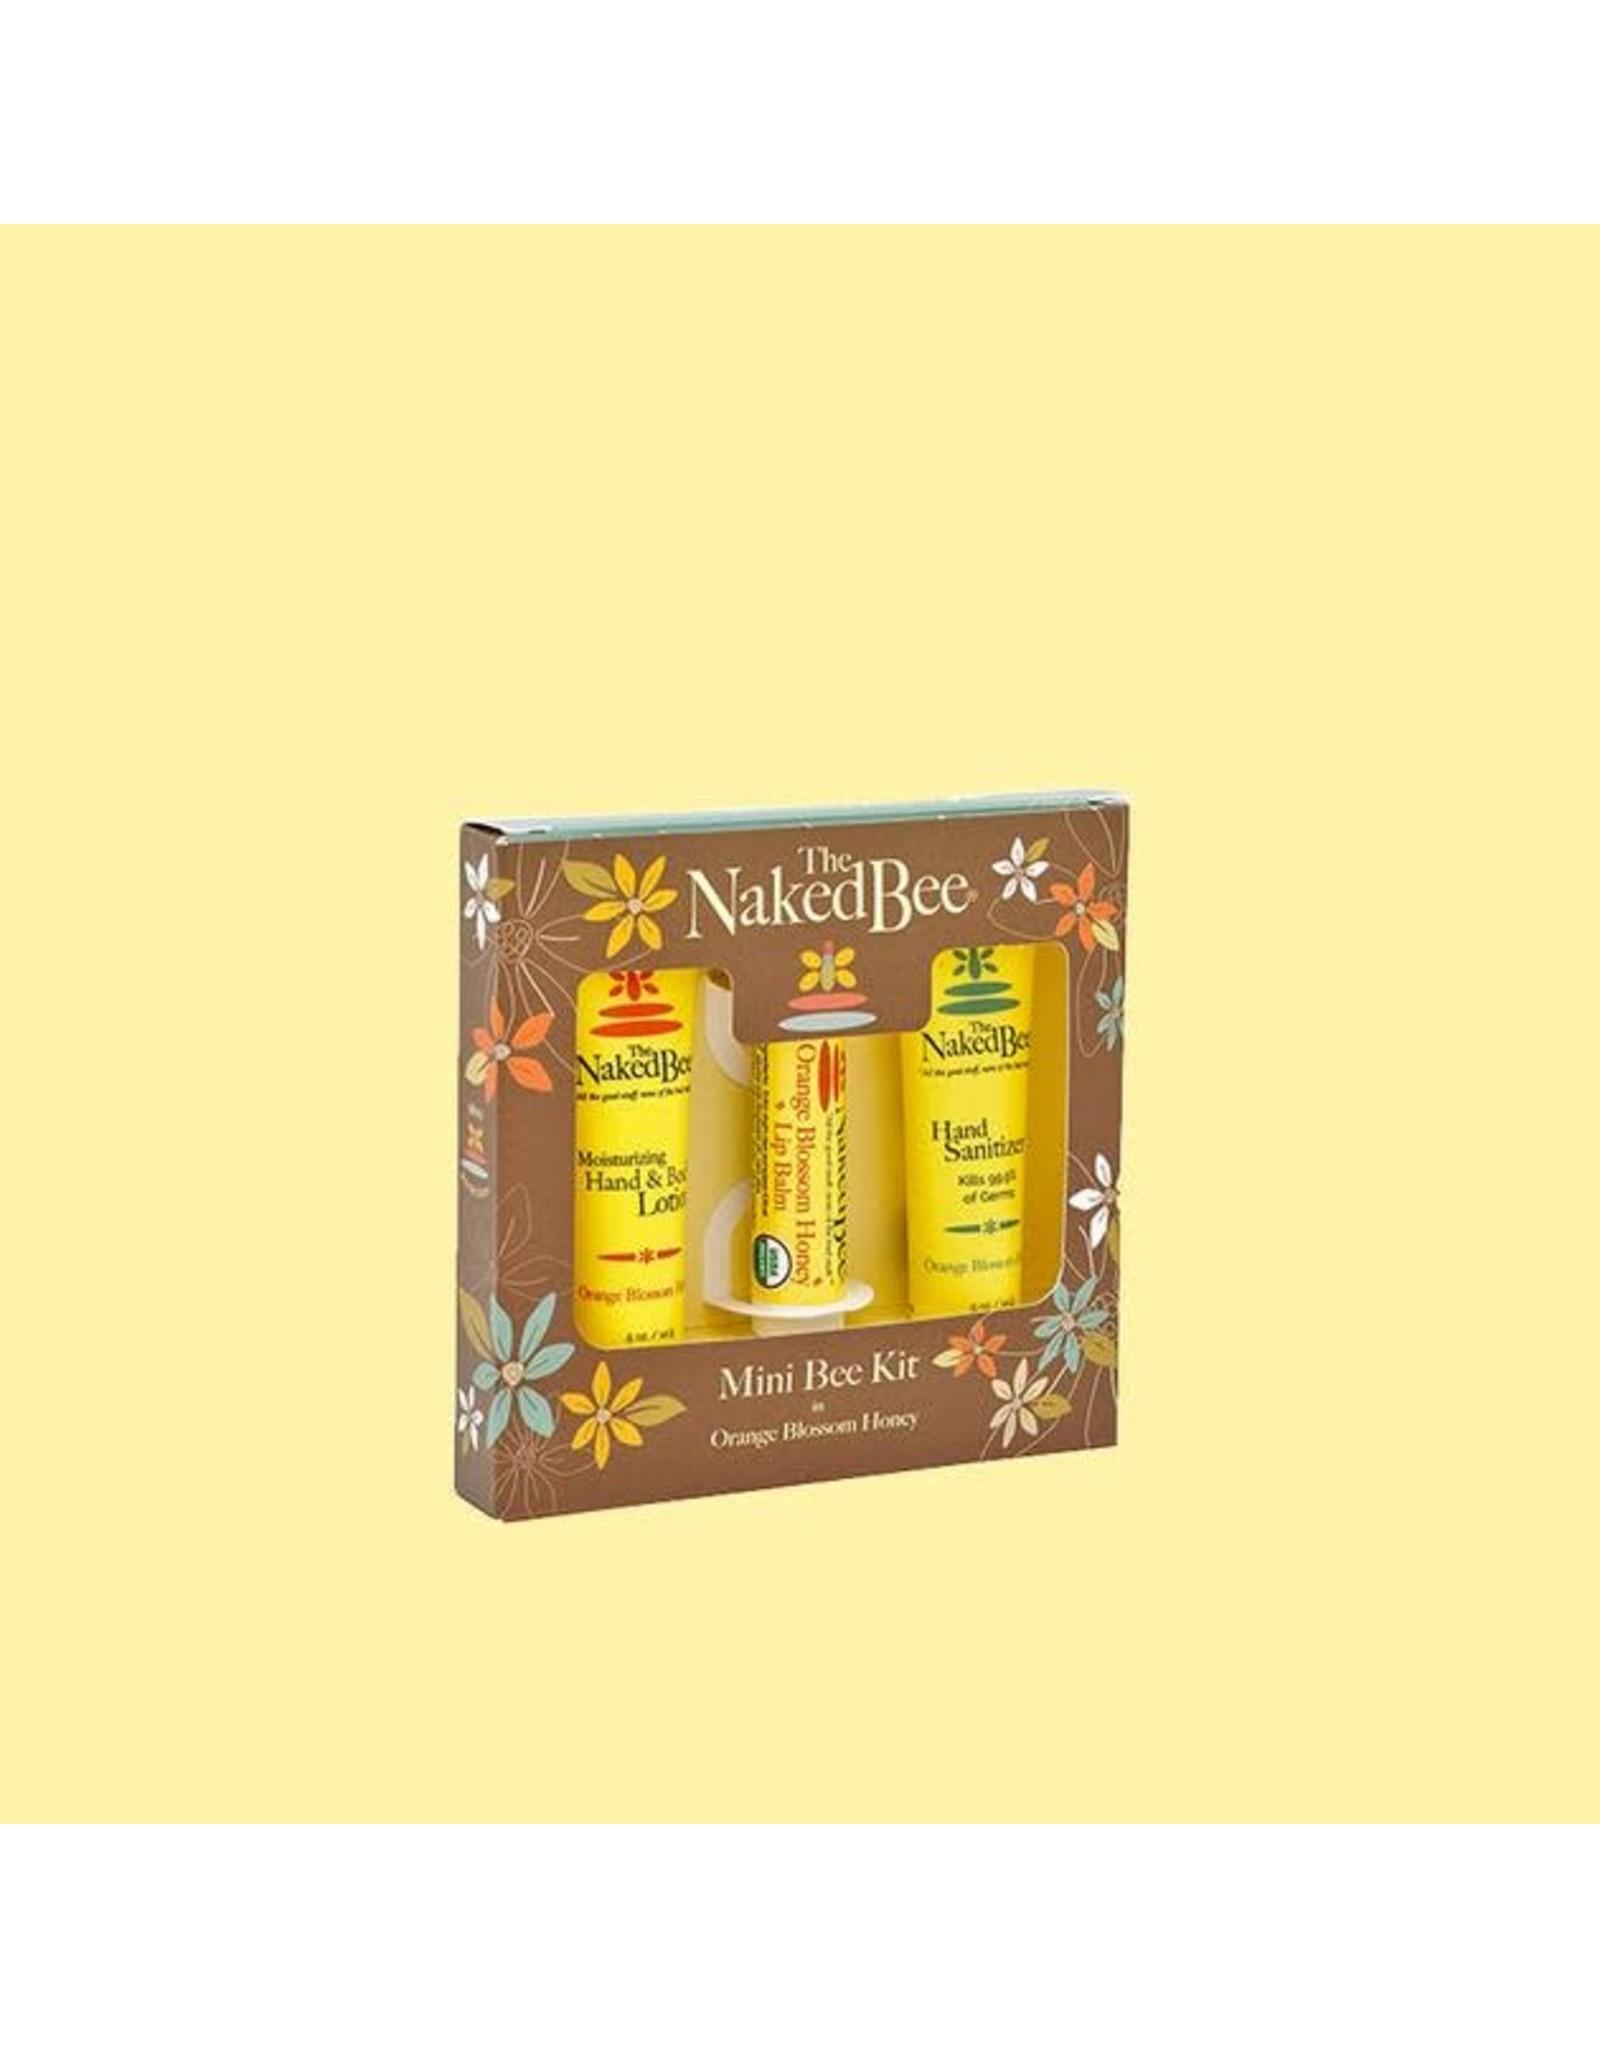 Mini Bee Kit-Lipbalm, Hand Sanitizer & Body Lotion